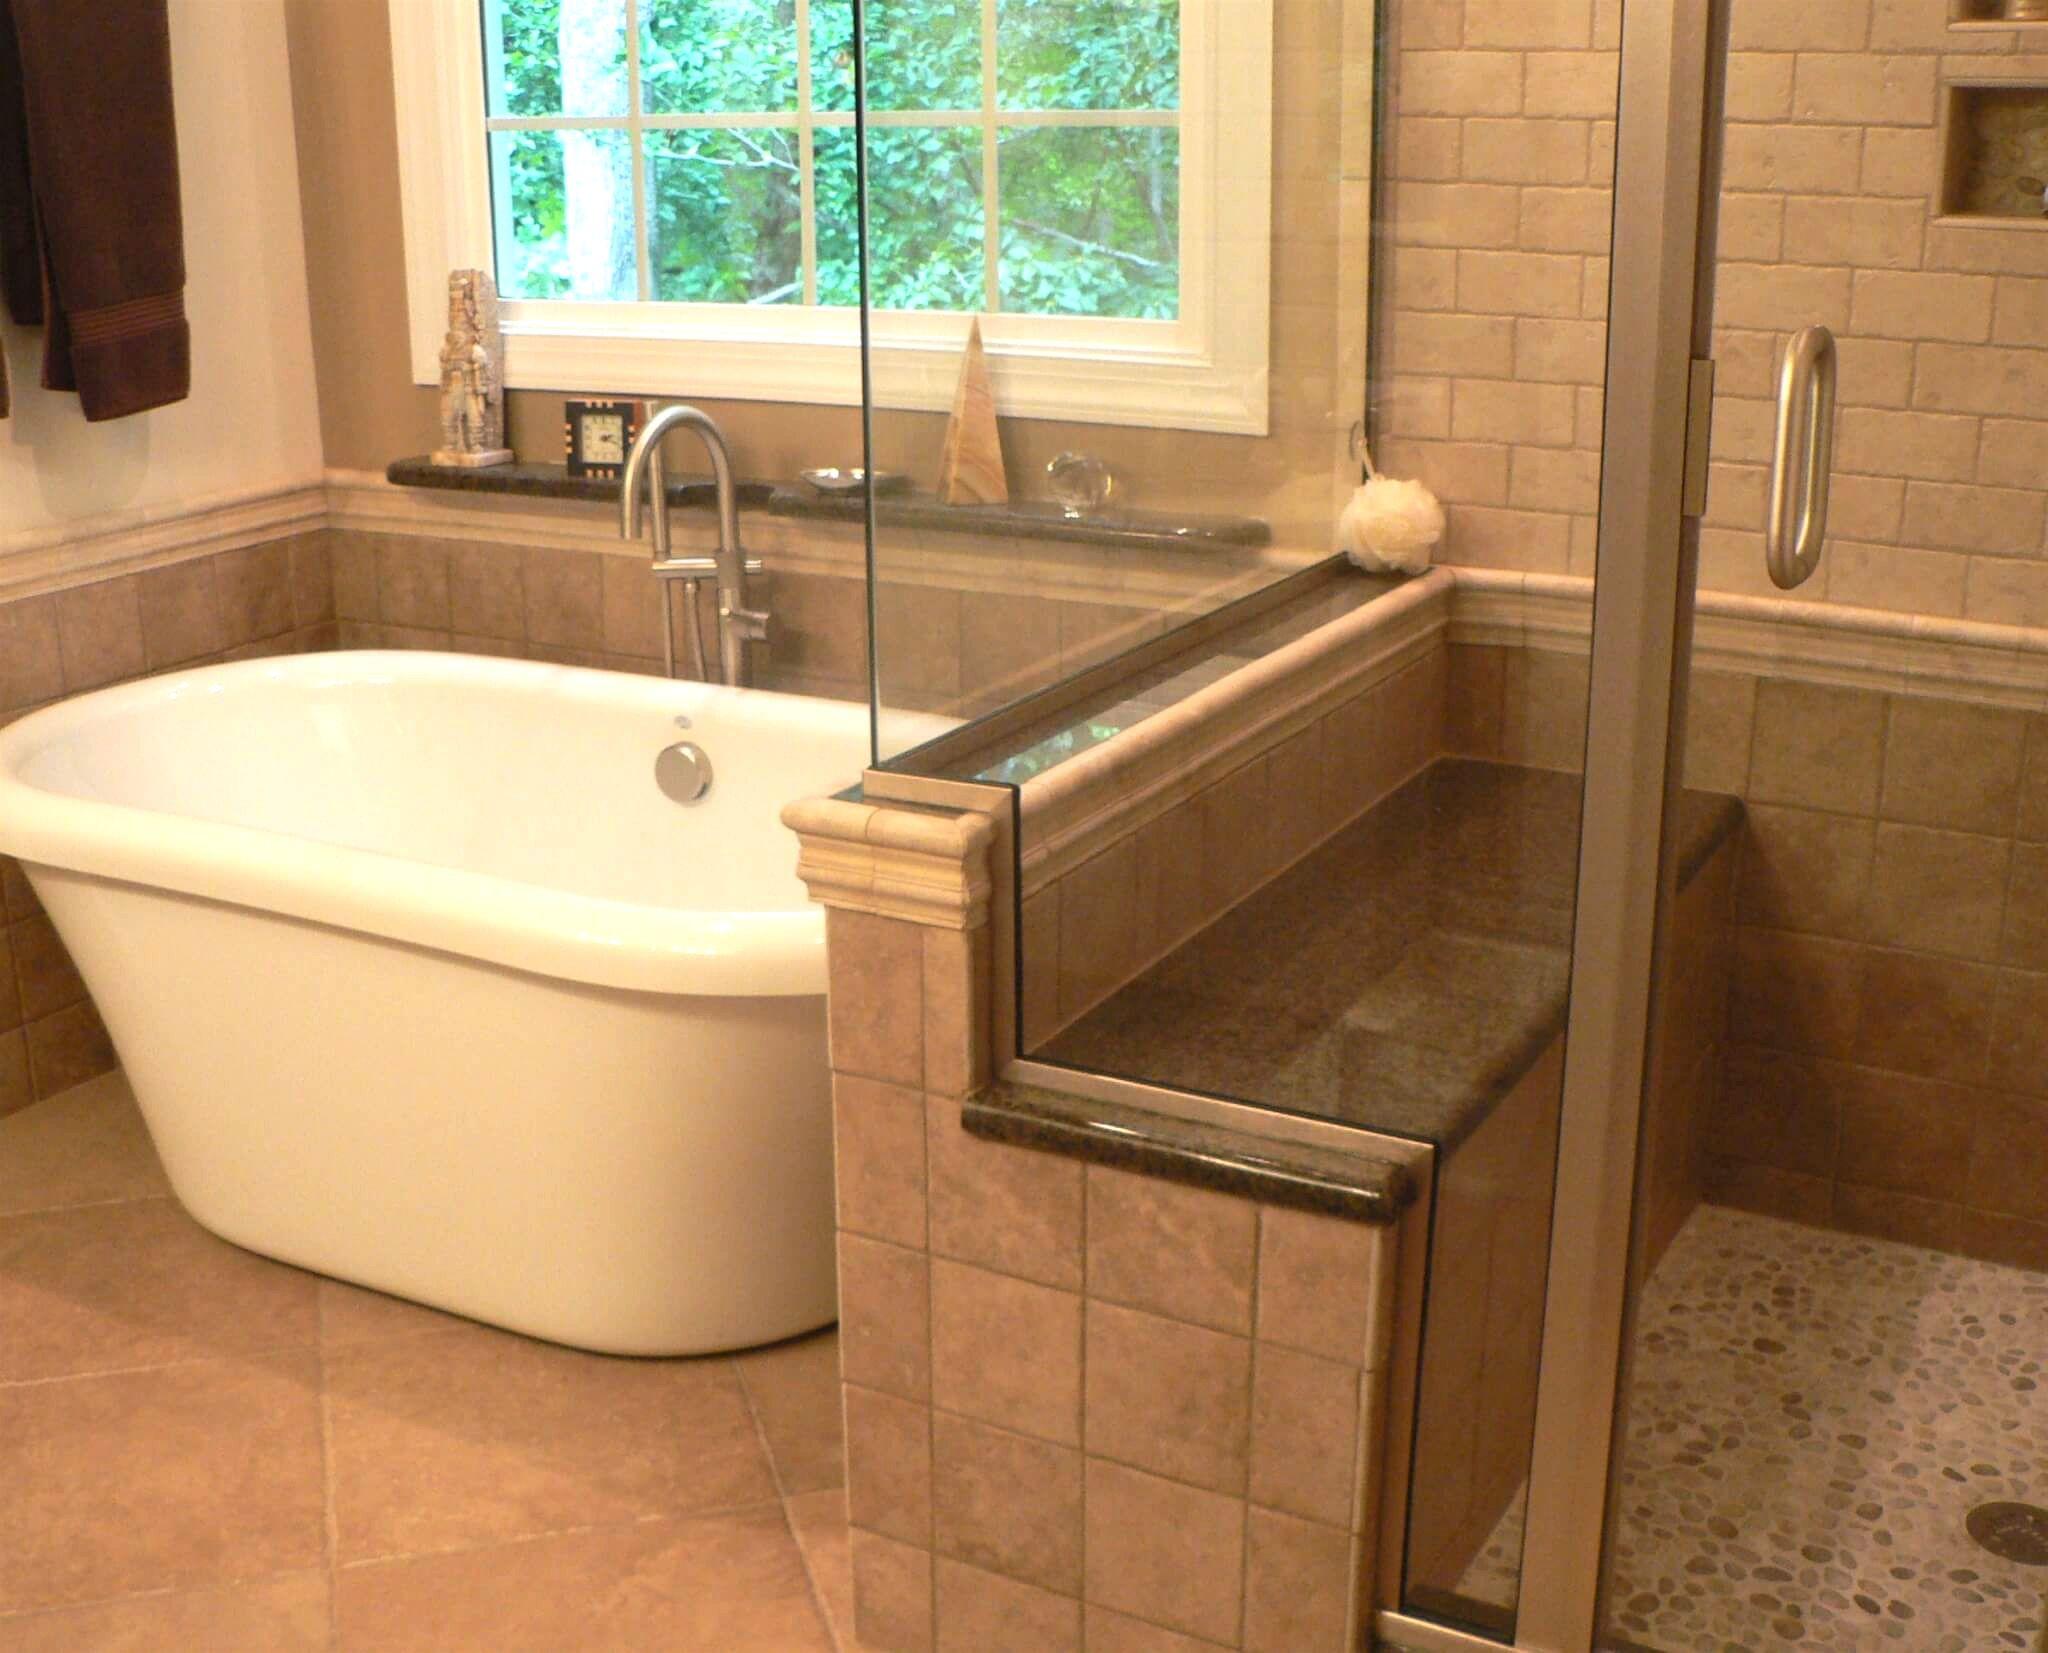 Kitchen and bath remodeling ideas breathtaking bathroom remodel best